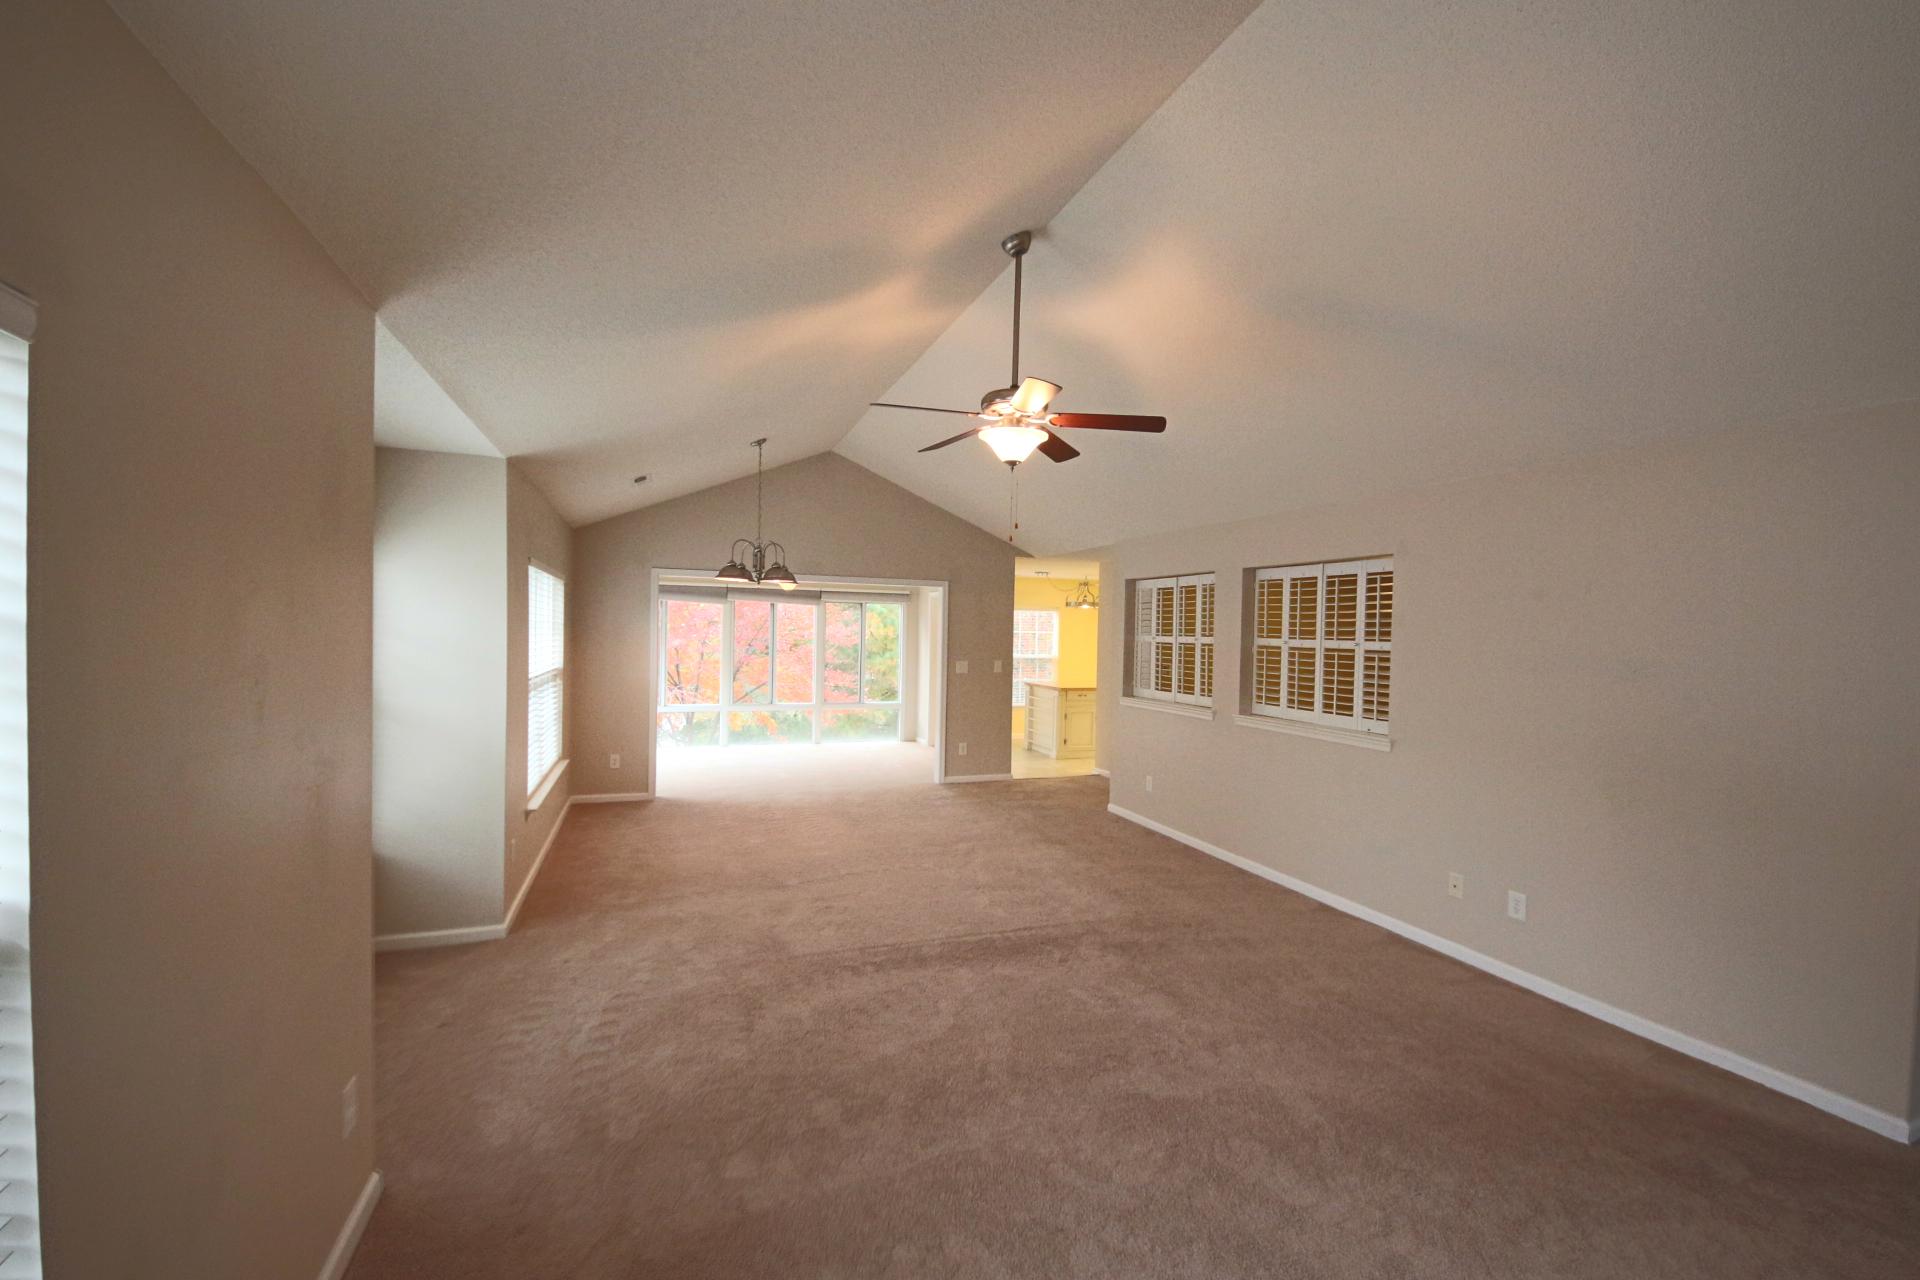 5. Main Room